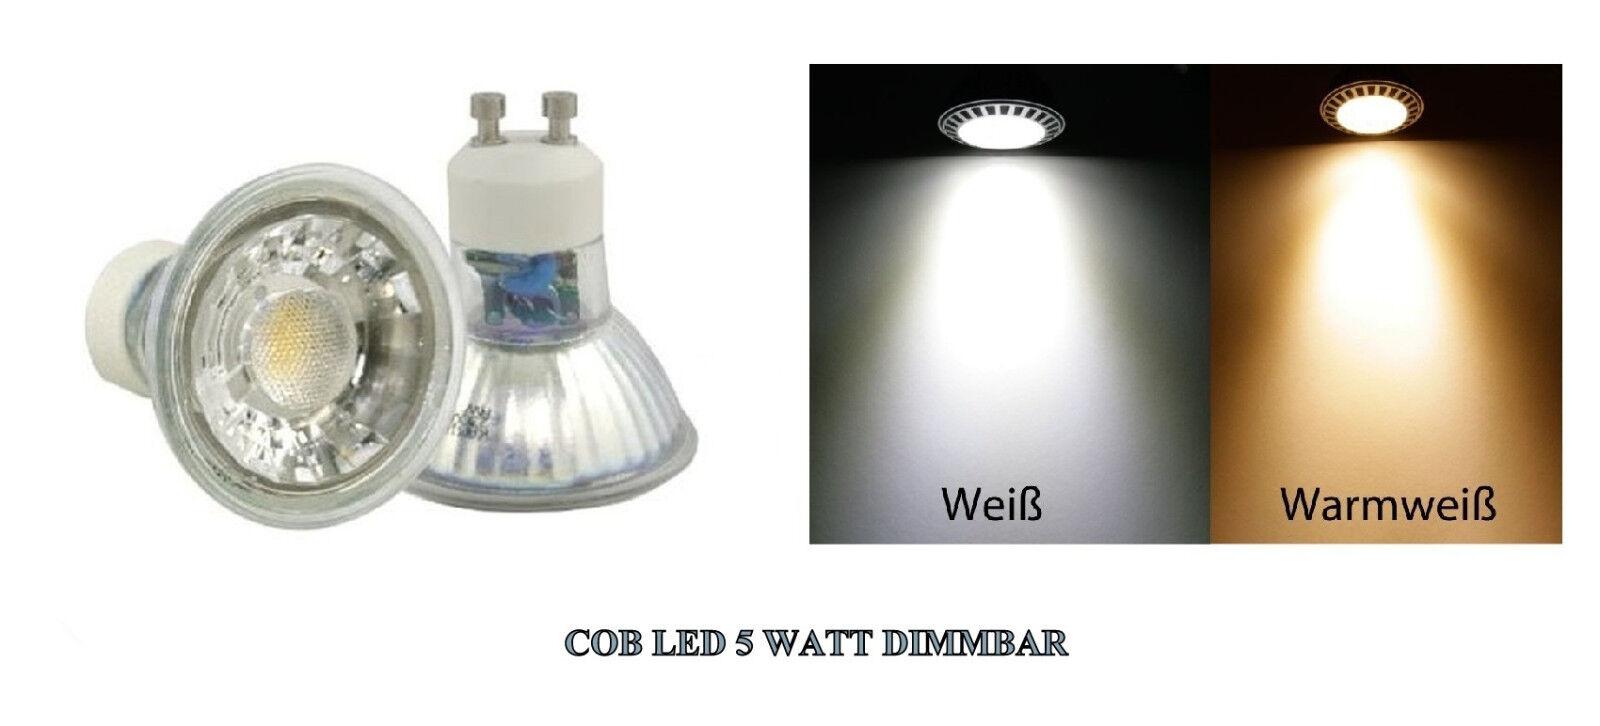 230v Power cob-led gu10 5w = 50w kaltweiss & warmweiss regulable